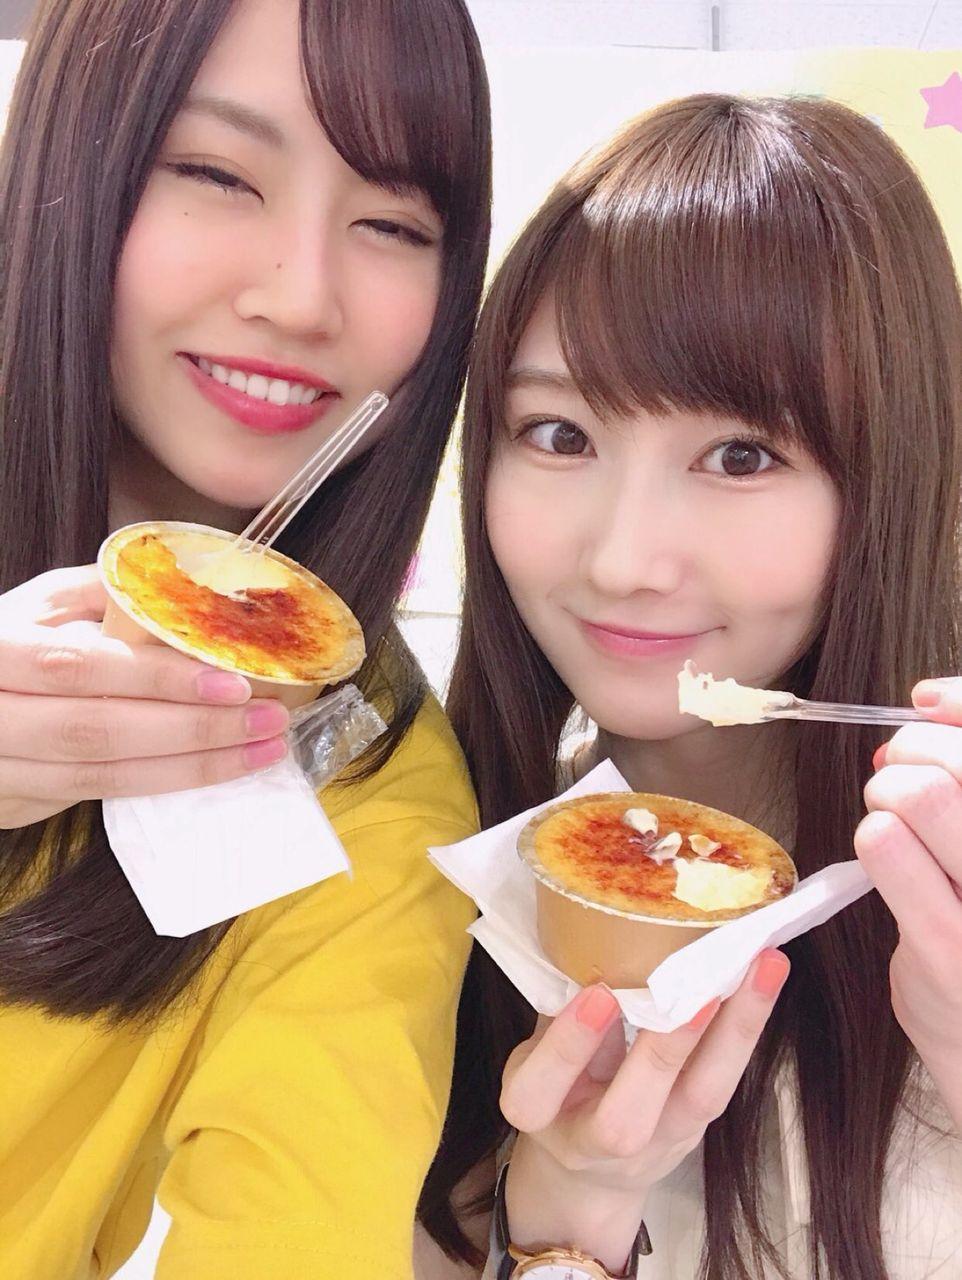 【NMB48】ふぅなる、PL花火大会を観に行く。【矢倉楓子・古賀成美】